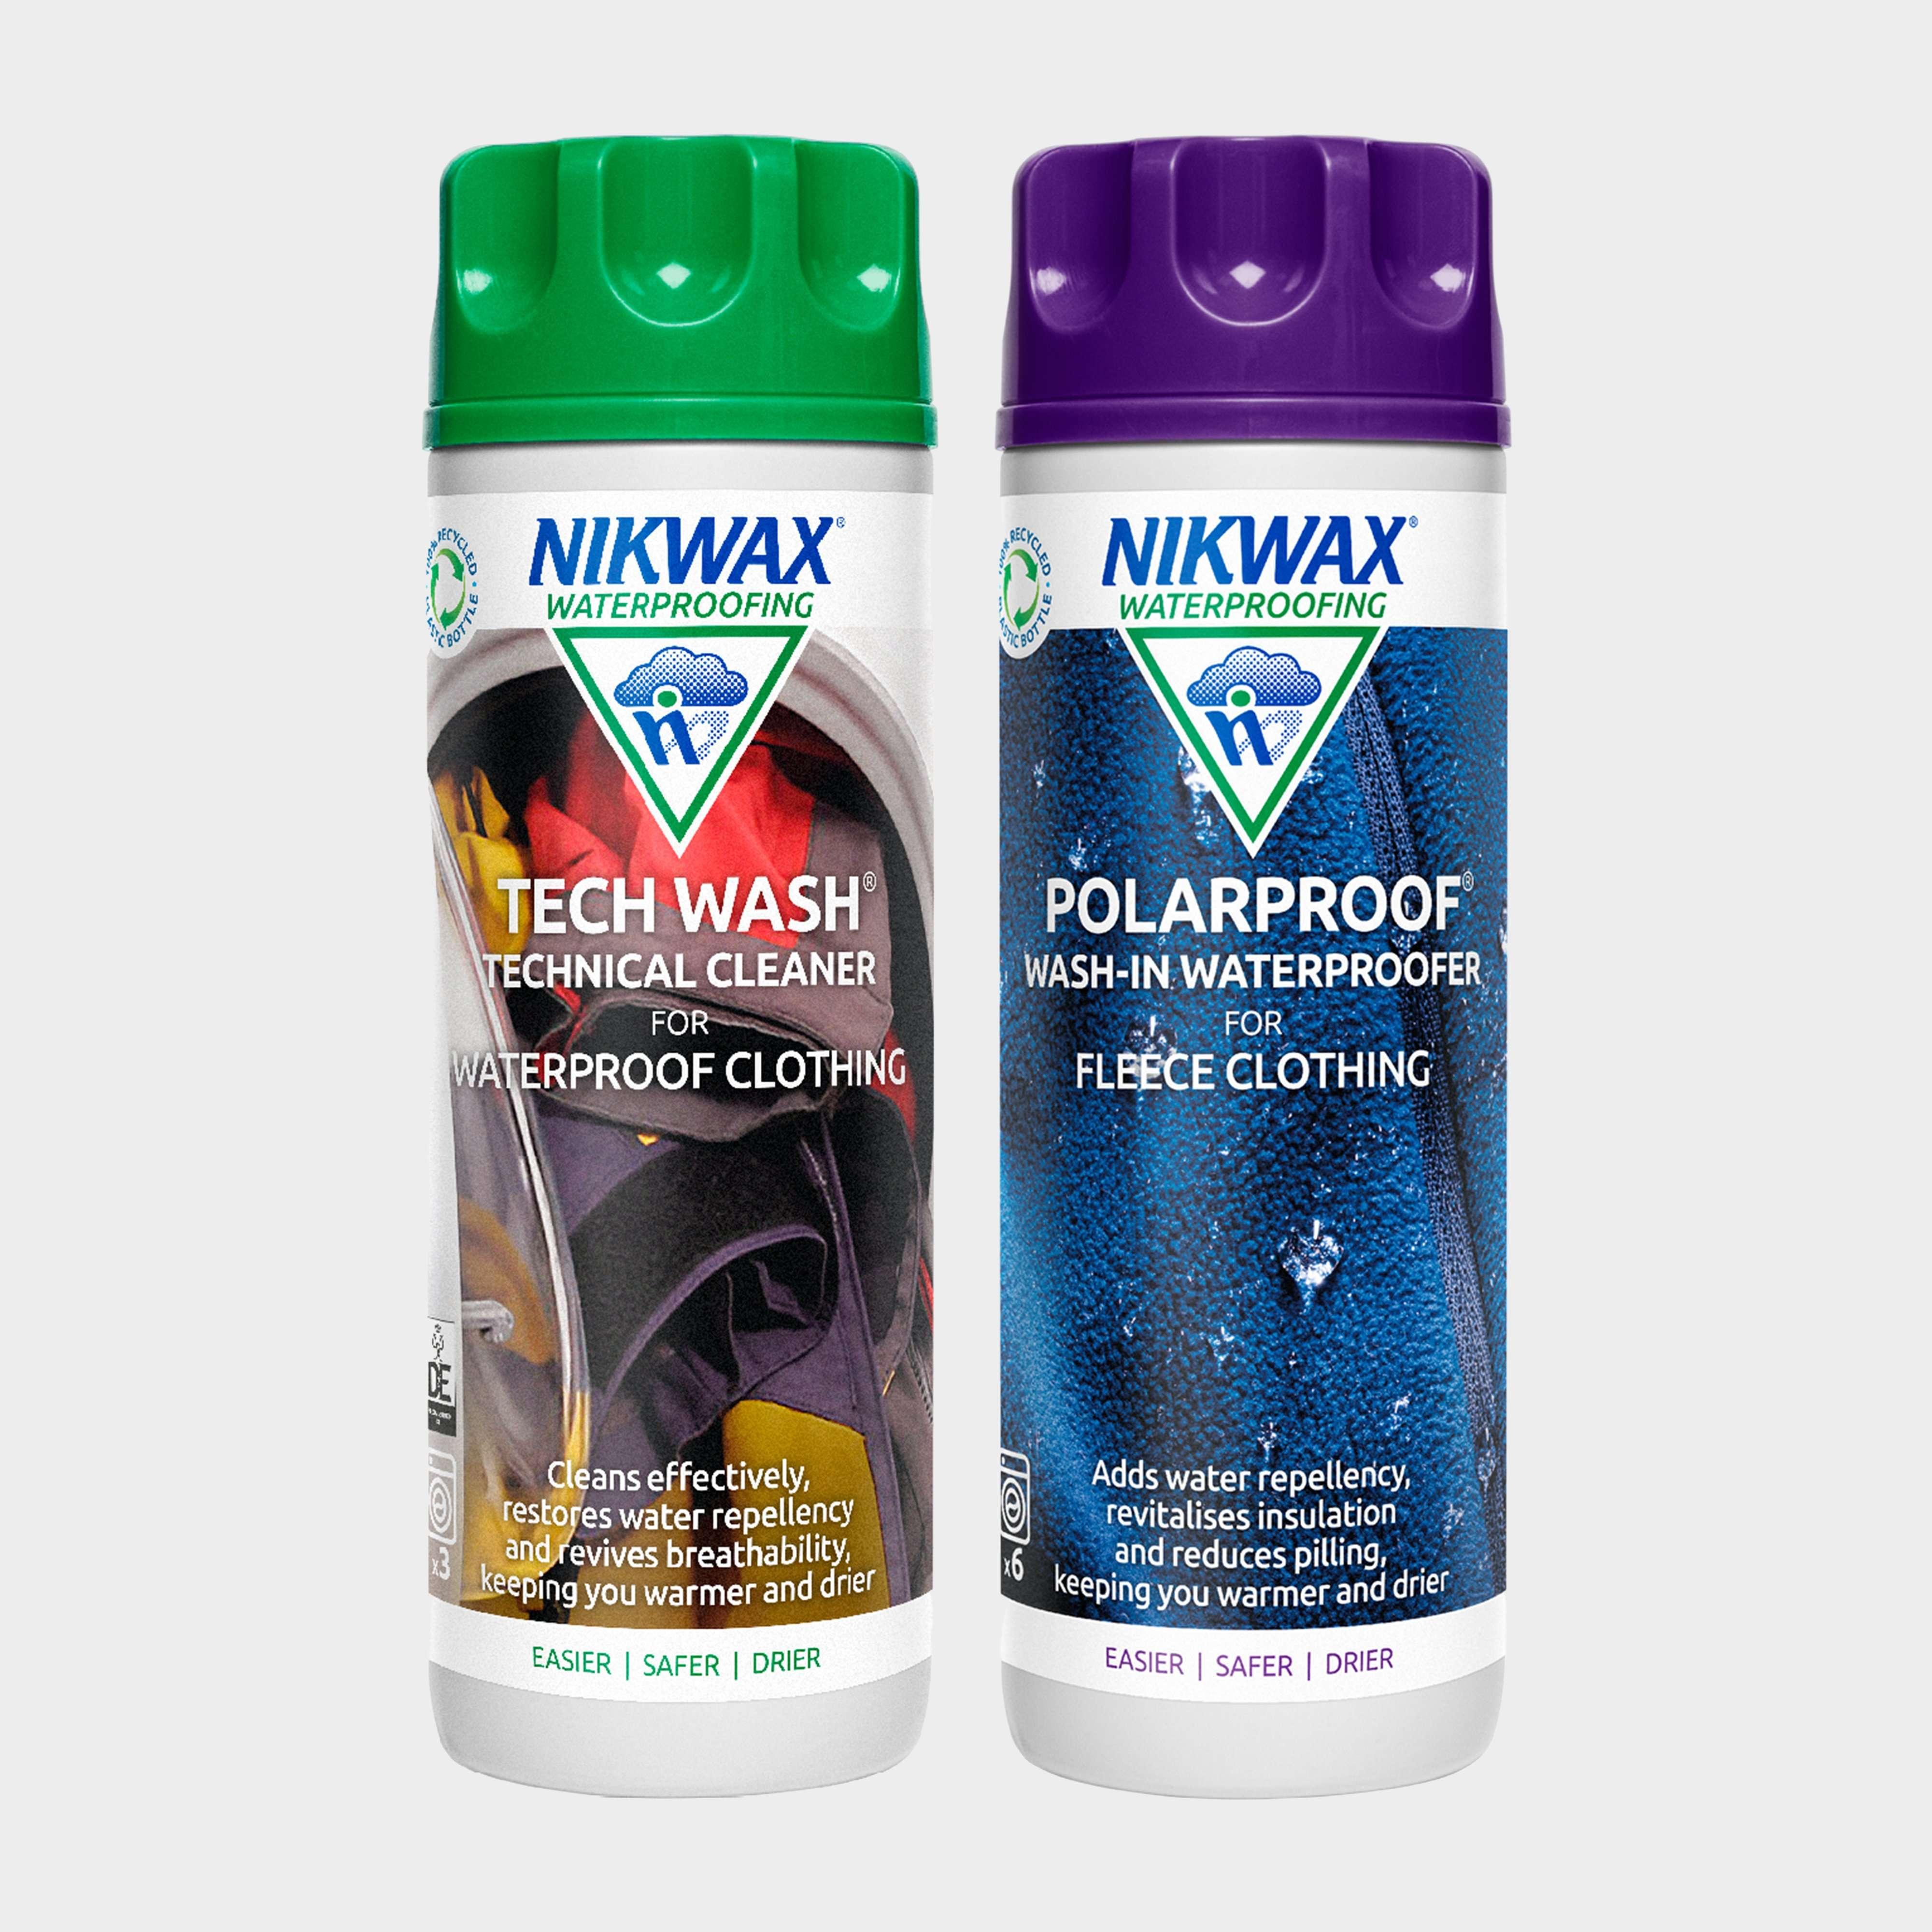 NIKWAX Tech Wash / Polar Proof Twin Pack